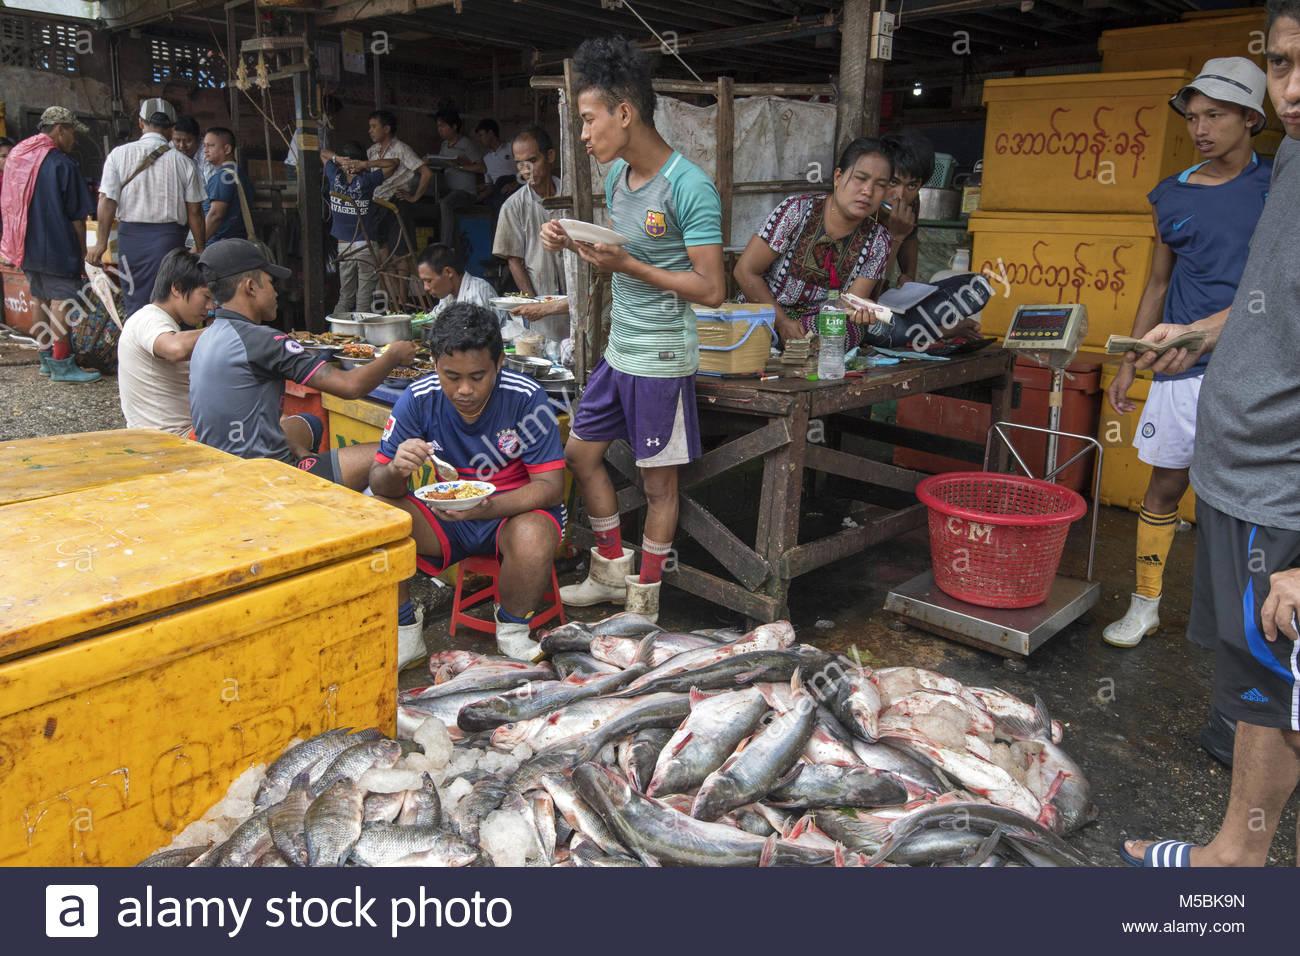 Wholesale trade asia stock photos wholesale trade asia for Wholesale fish market